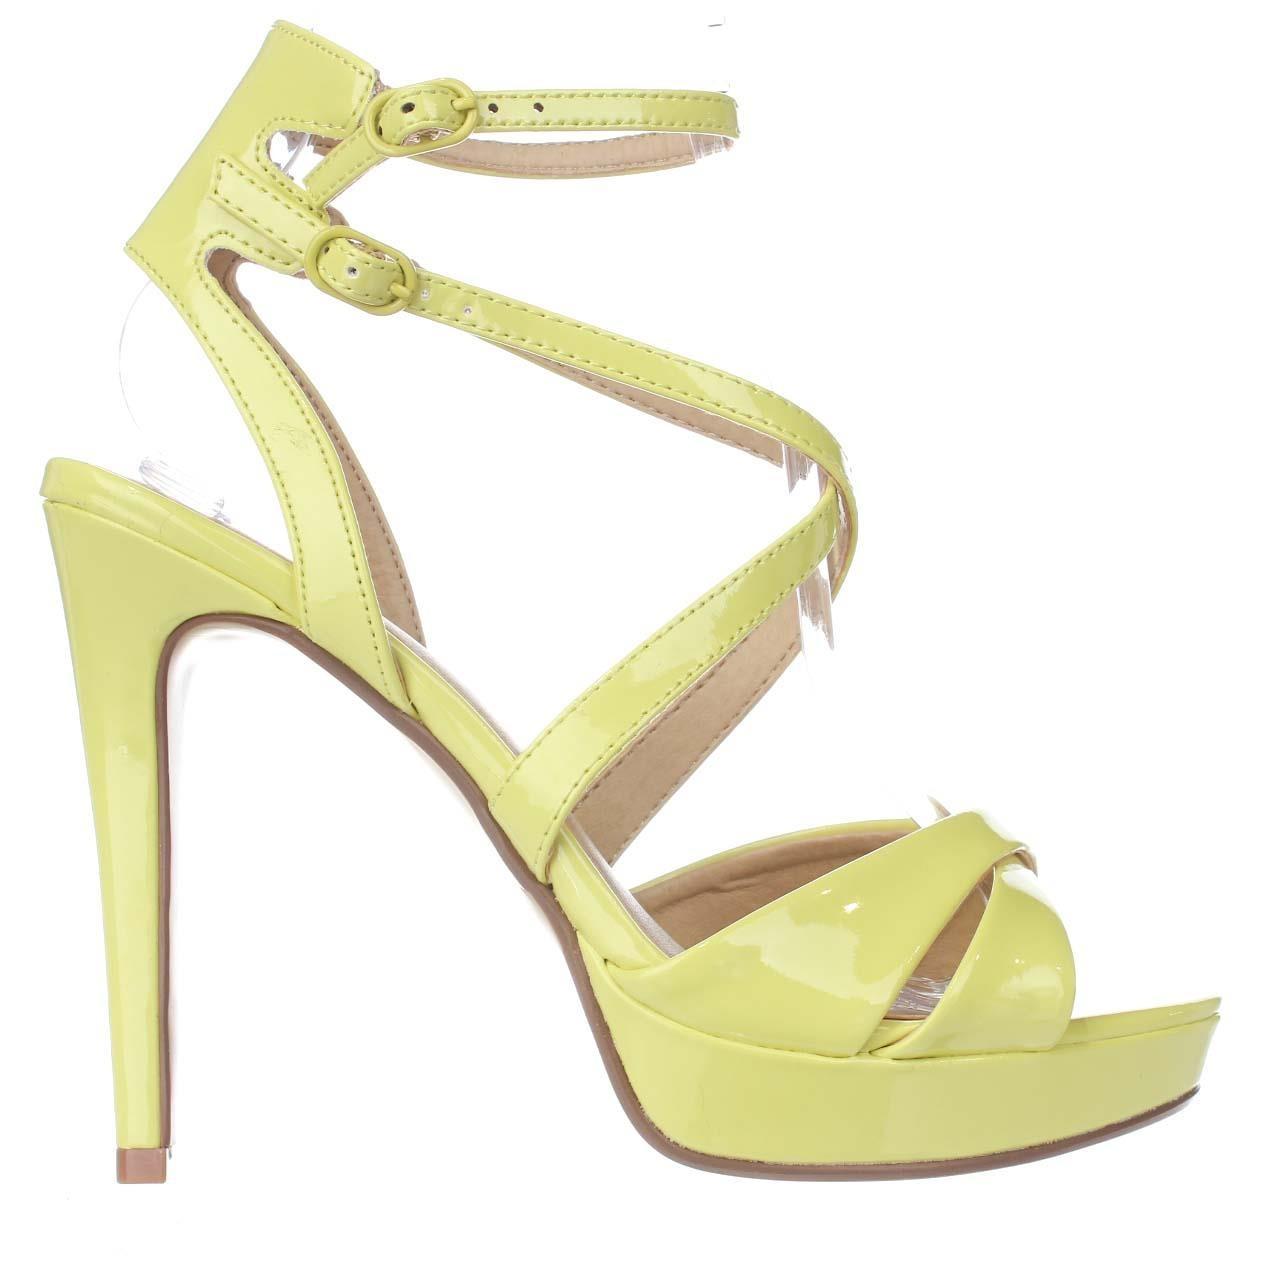 e398aac1e52f Chinese Laundry HIghlight Womens Heels   Pumps Lemon 7.5 US   5.5 UK ...